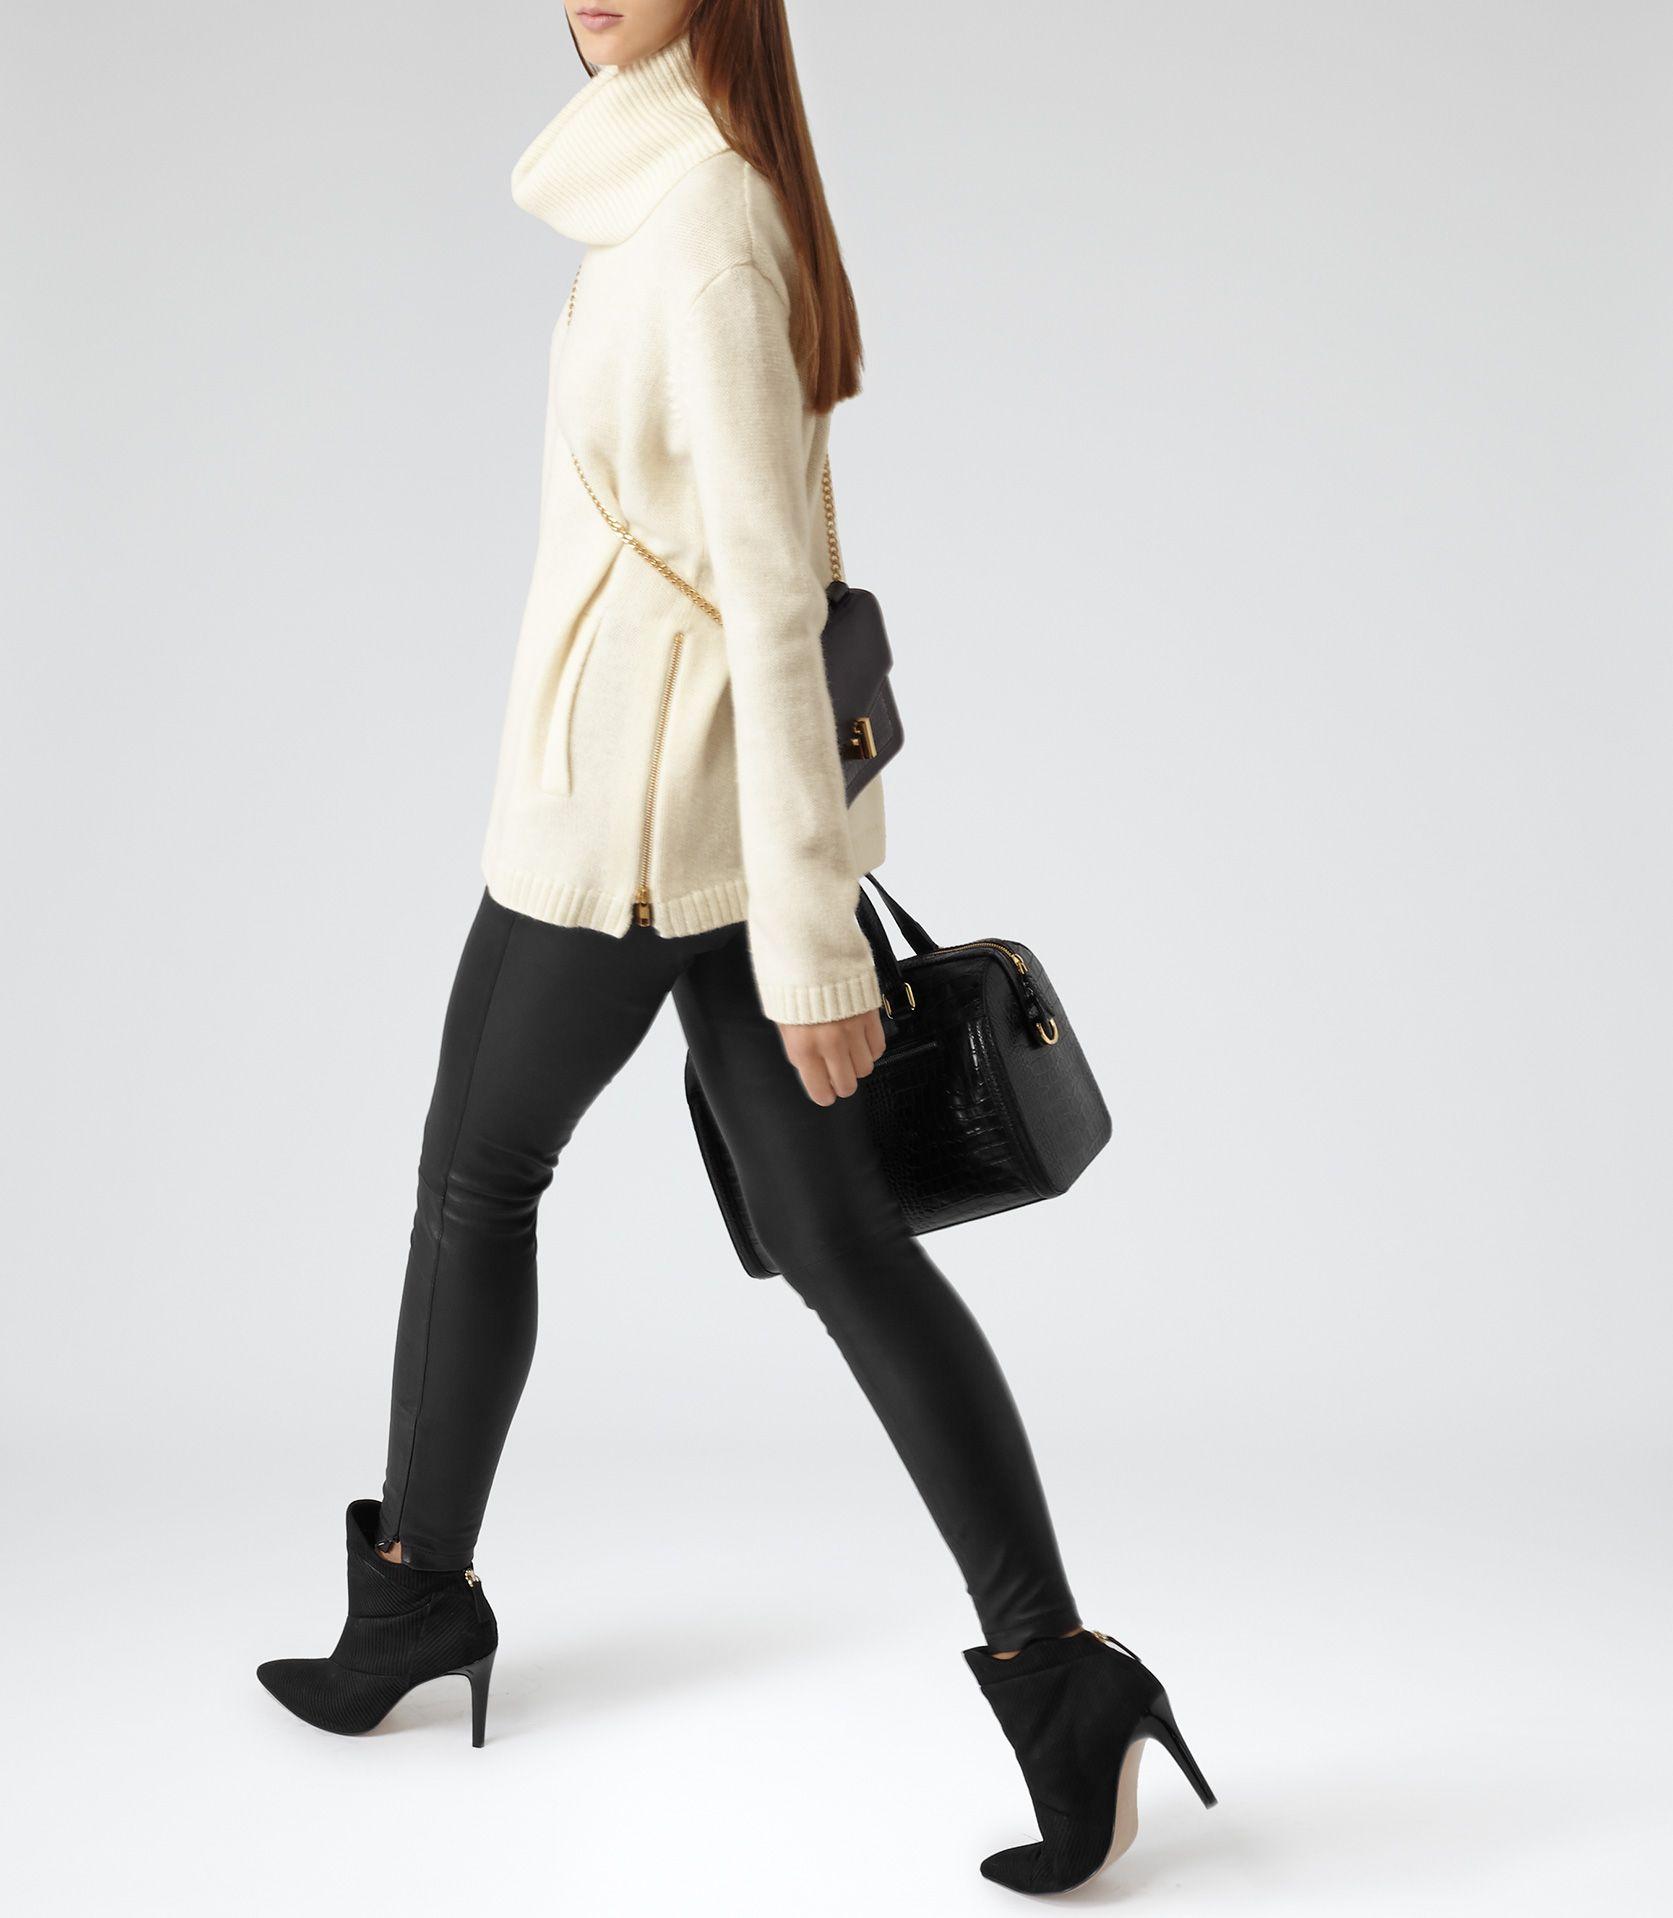 Ladies leather gloves asda - Womens Chalk Embellished Roll Neck Jumper Reiss Malin